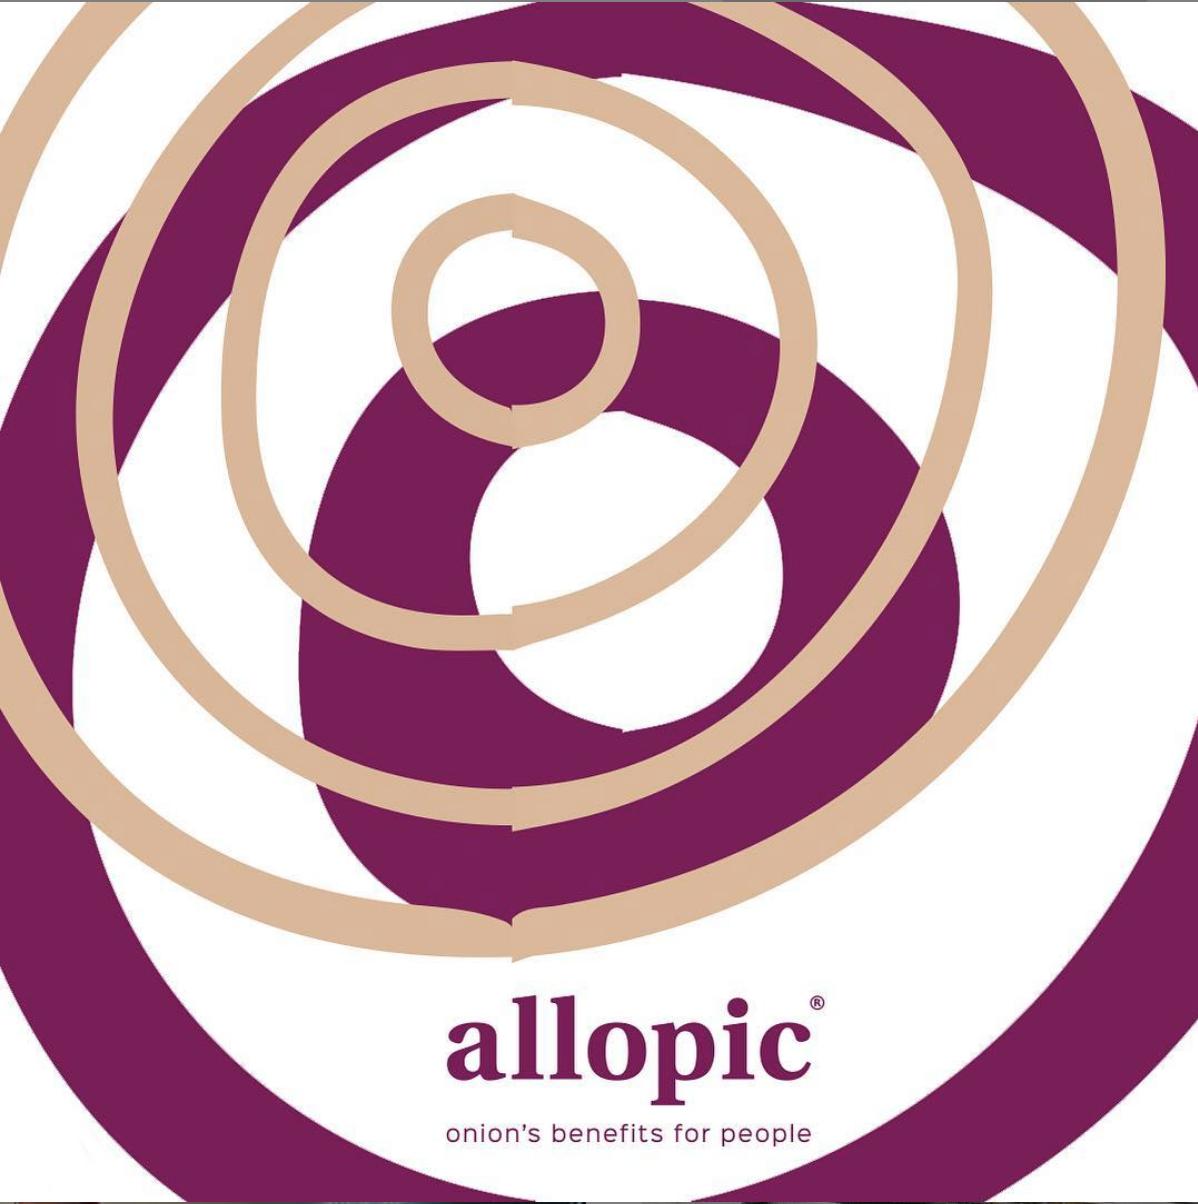 ALLOPIC